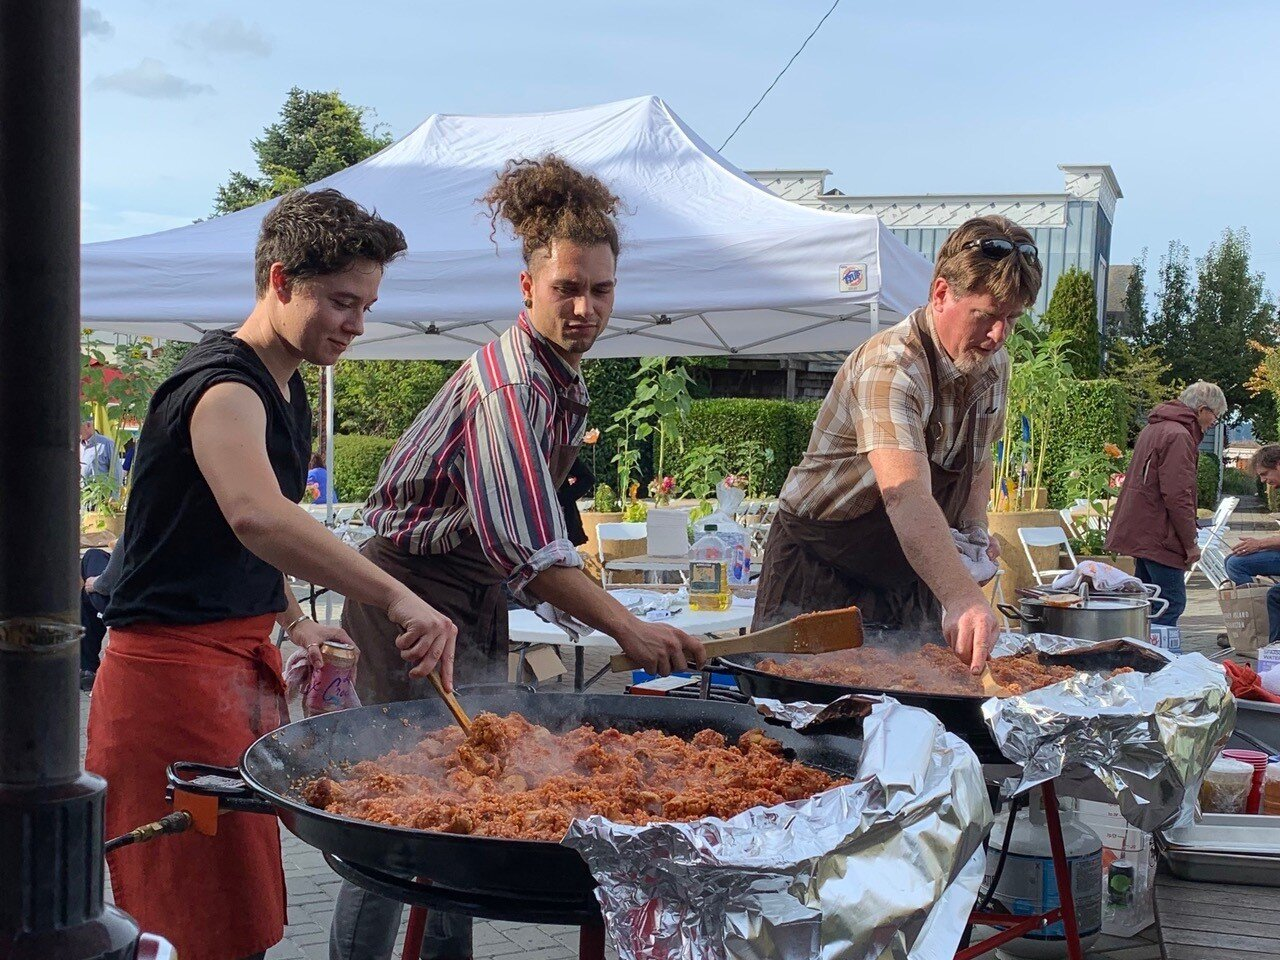 Orchard Kitchen Paella Langley Community Feast.jpg